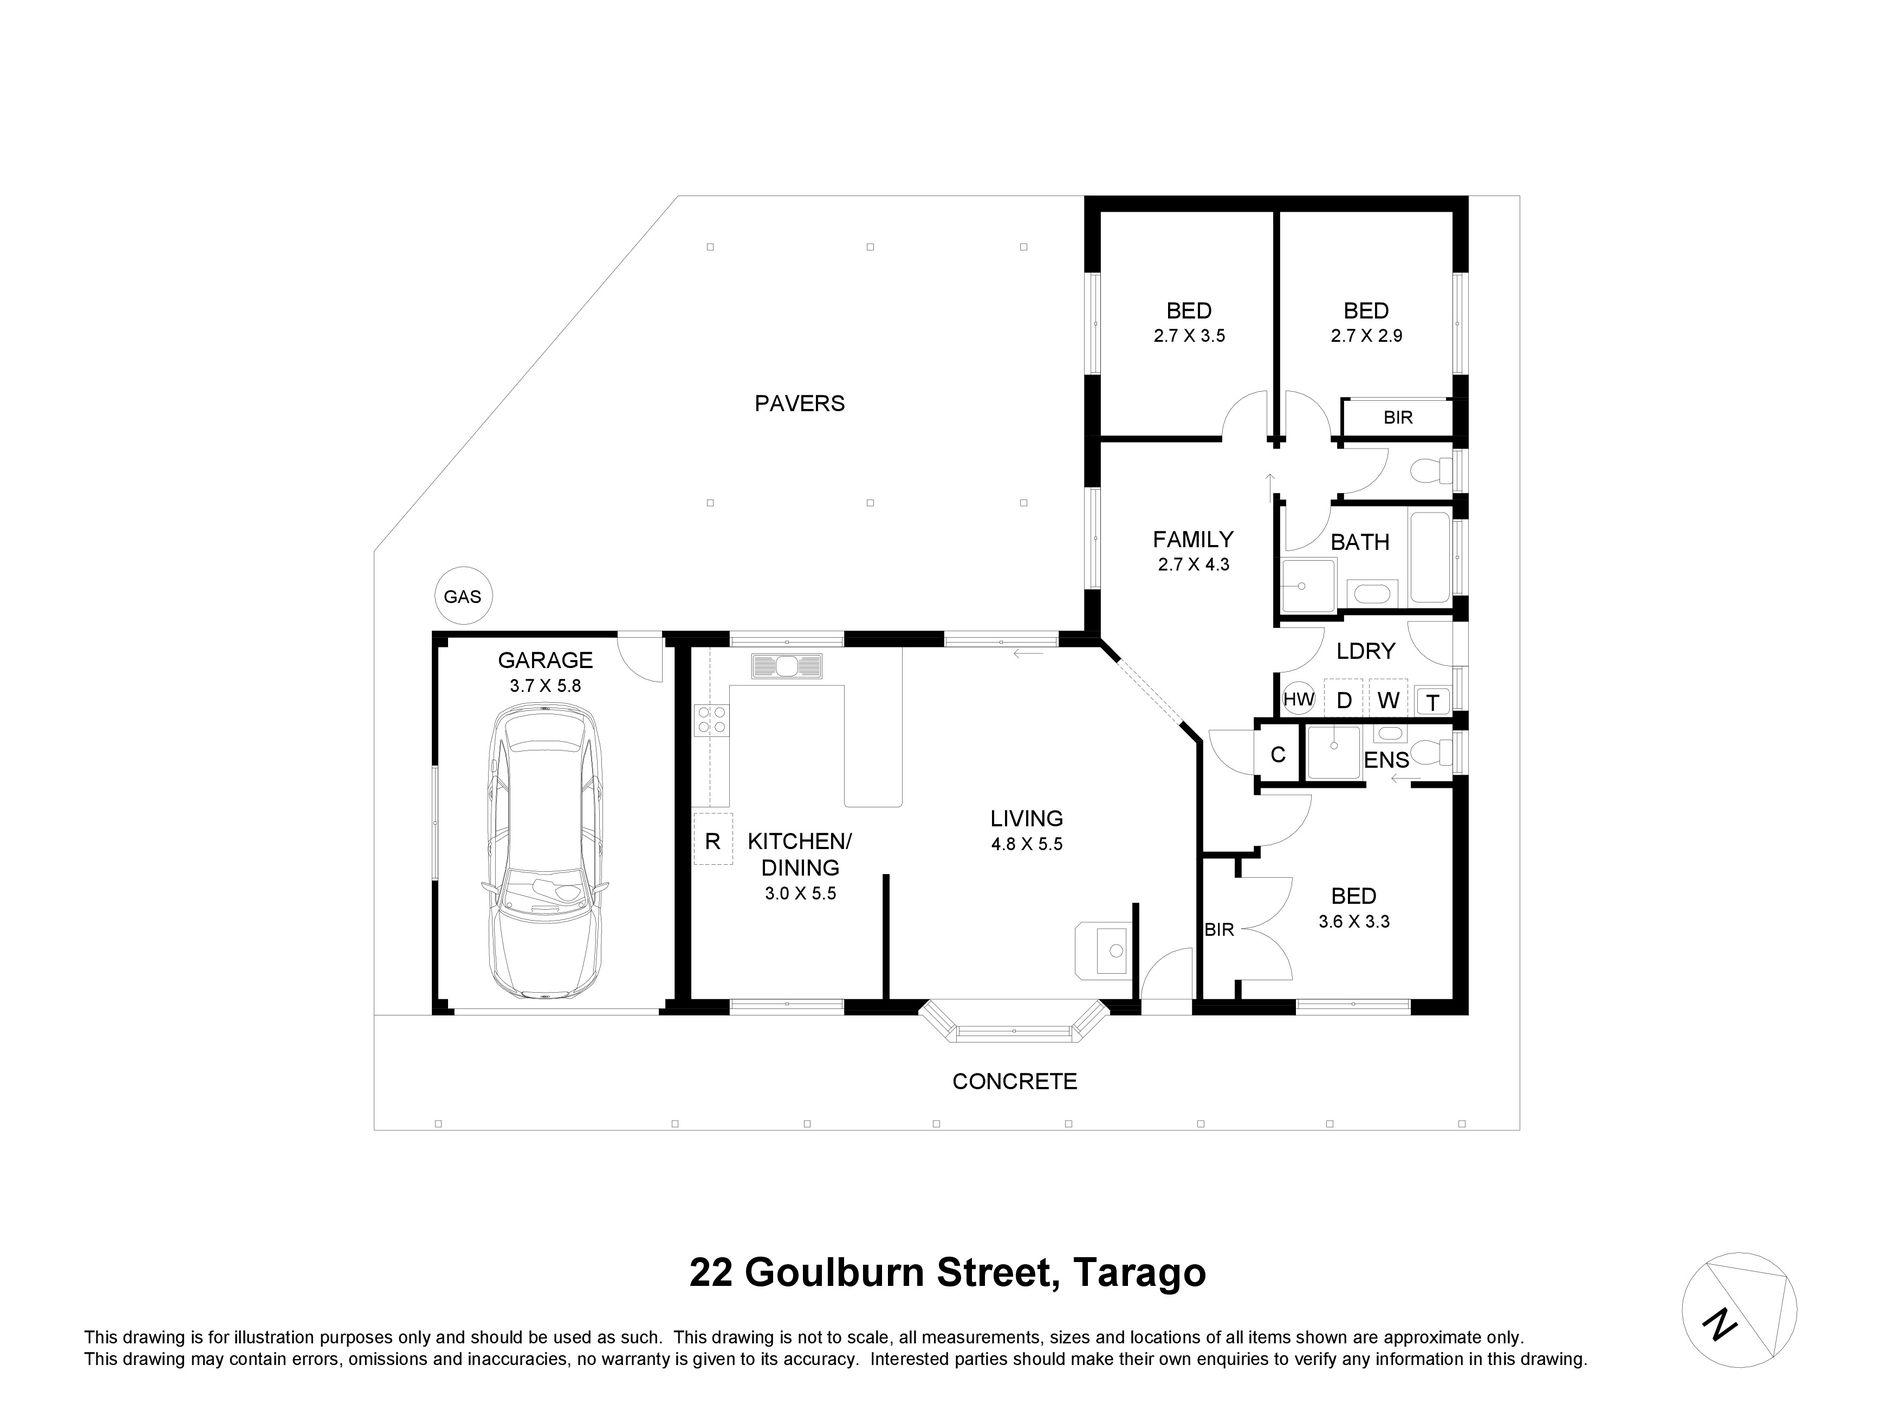 22 Goulburn Street, Tarago